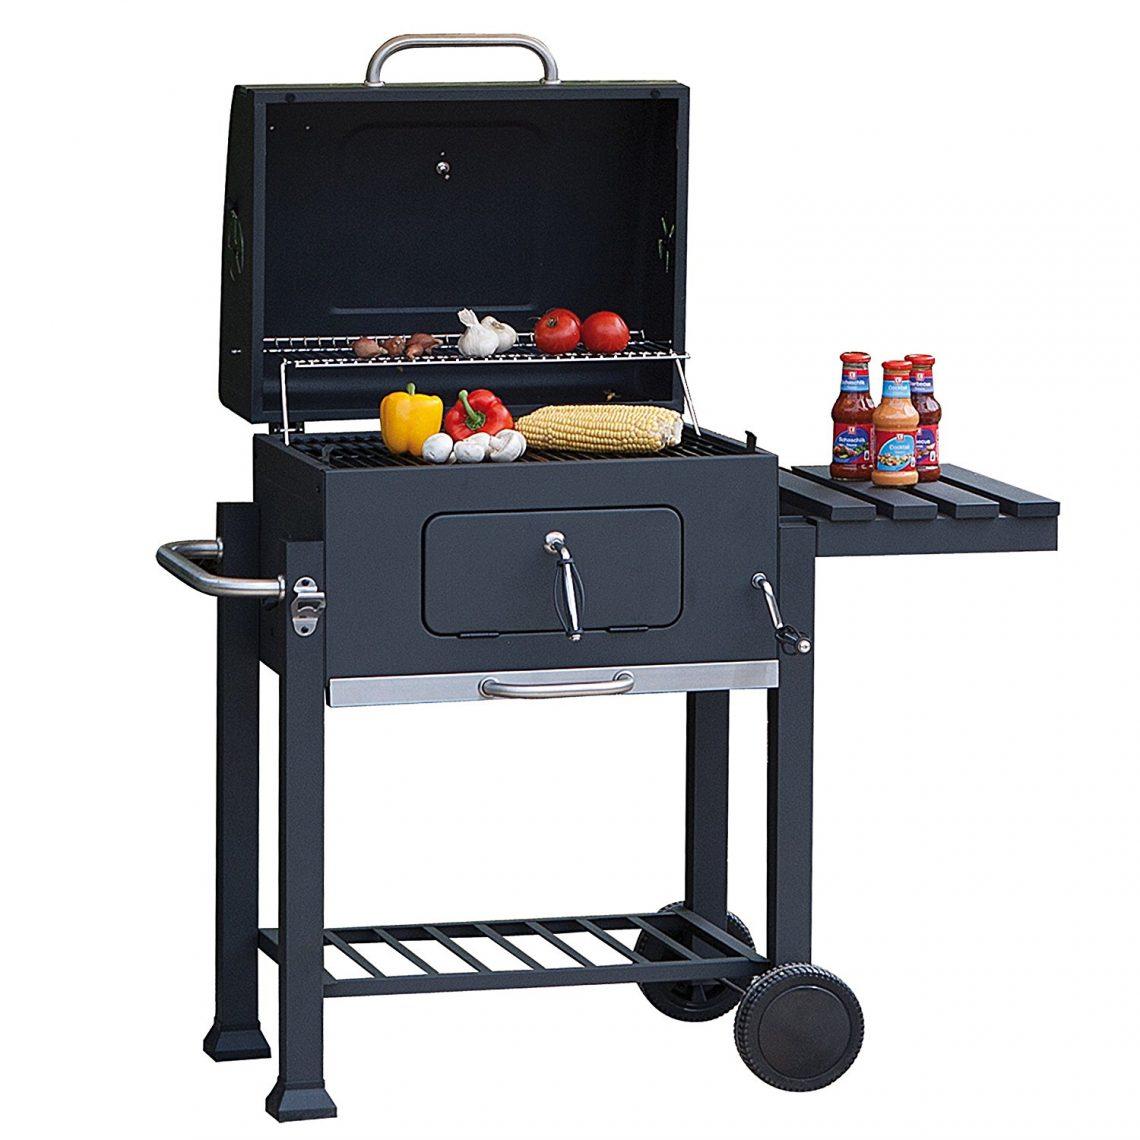 Barbecue Tepro Toronto